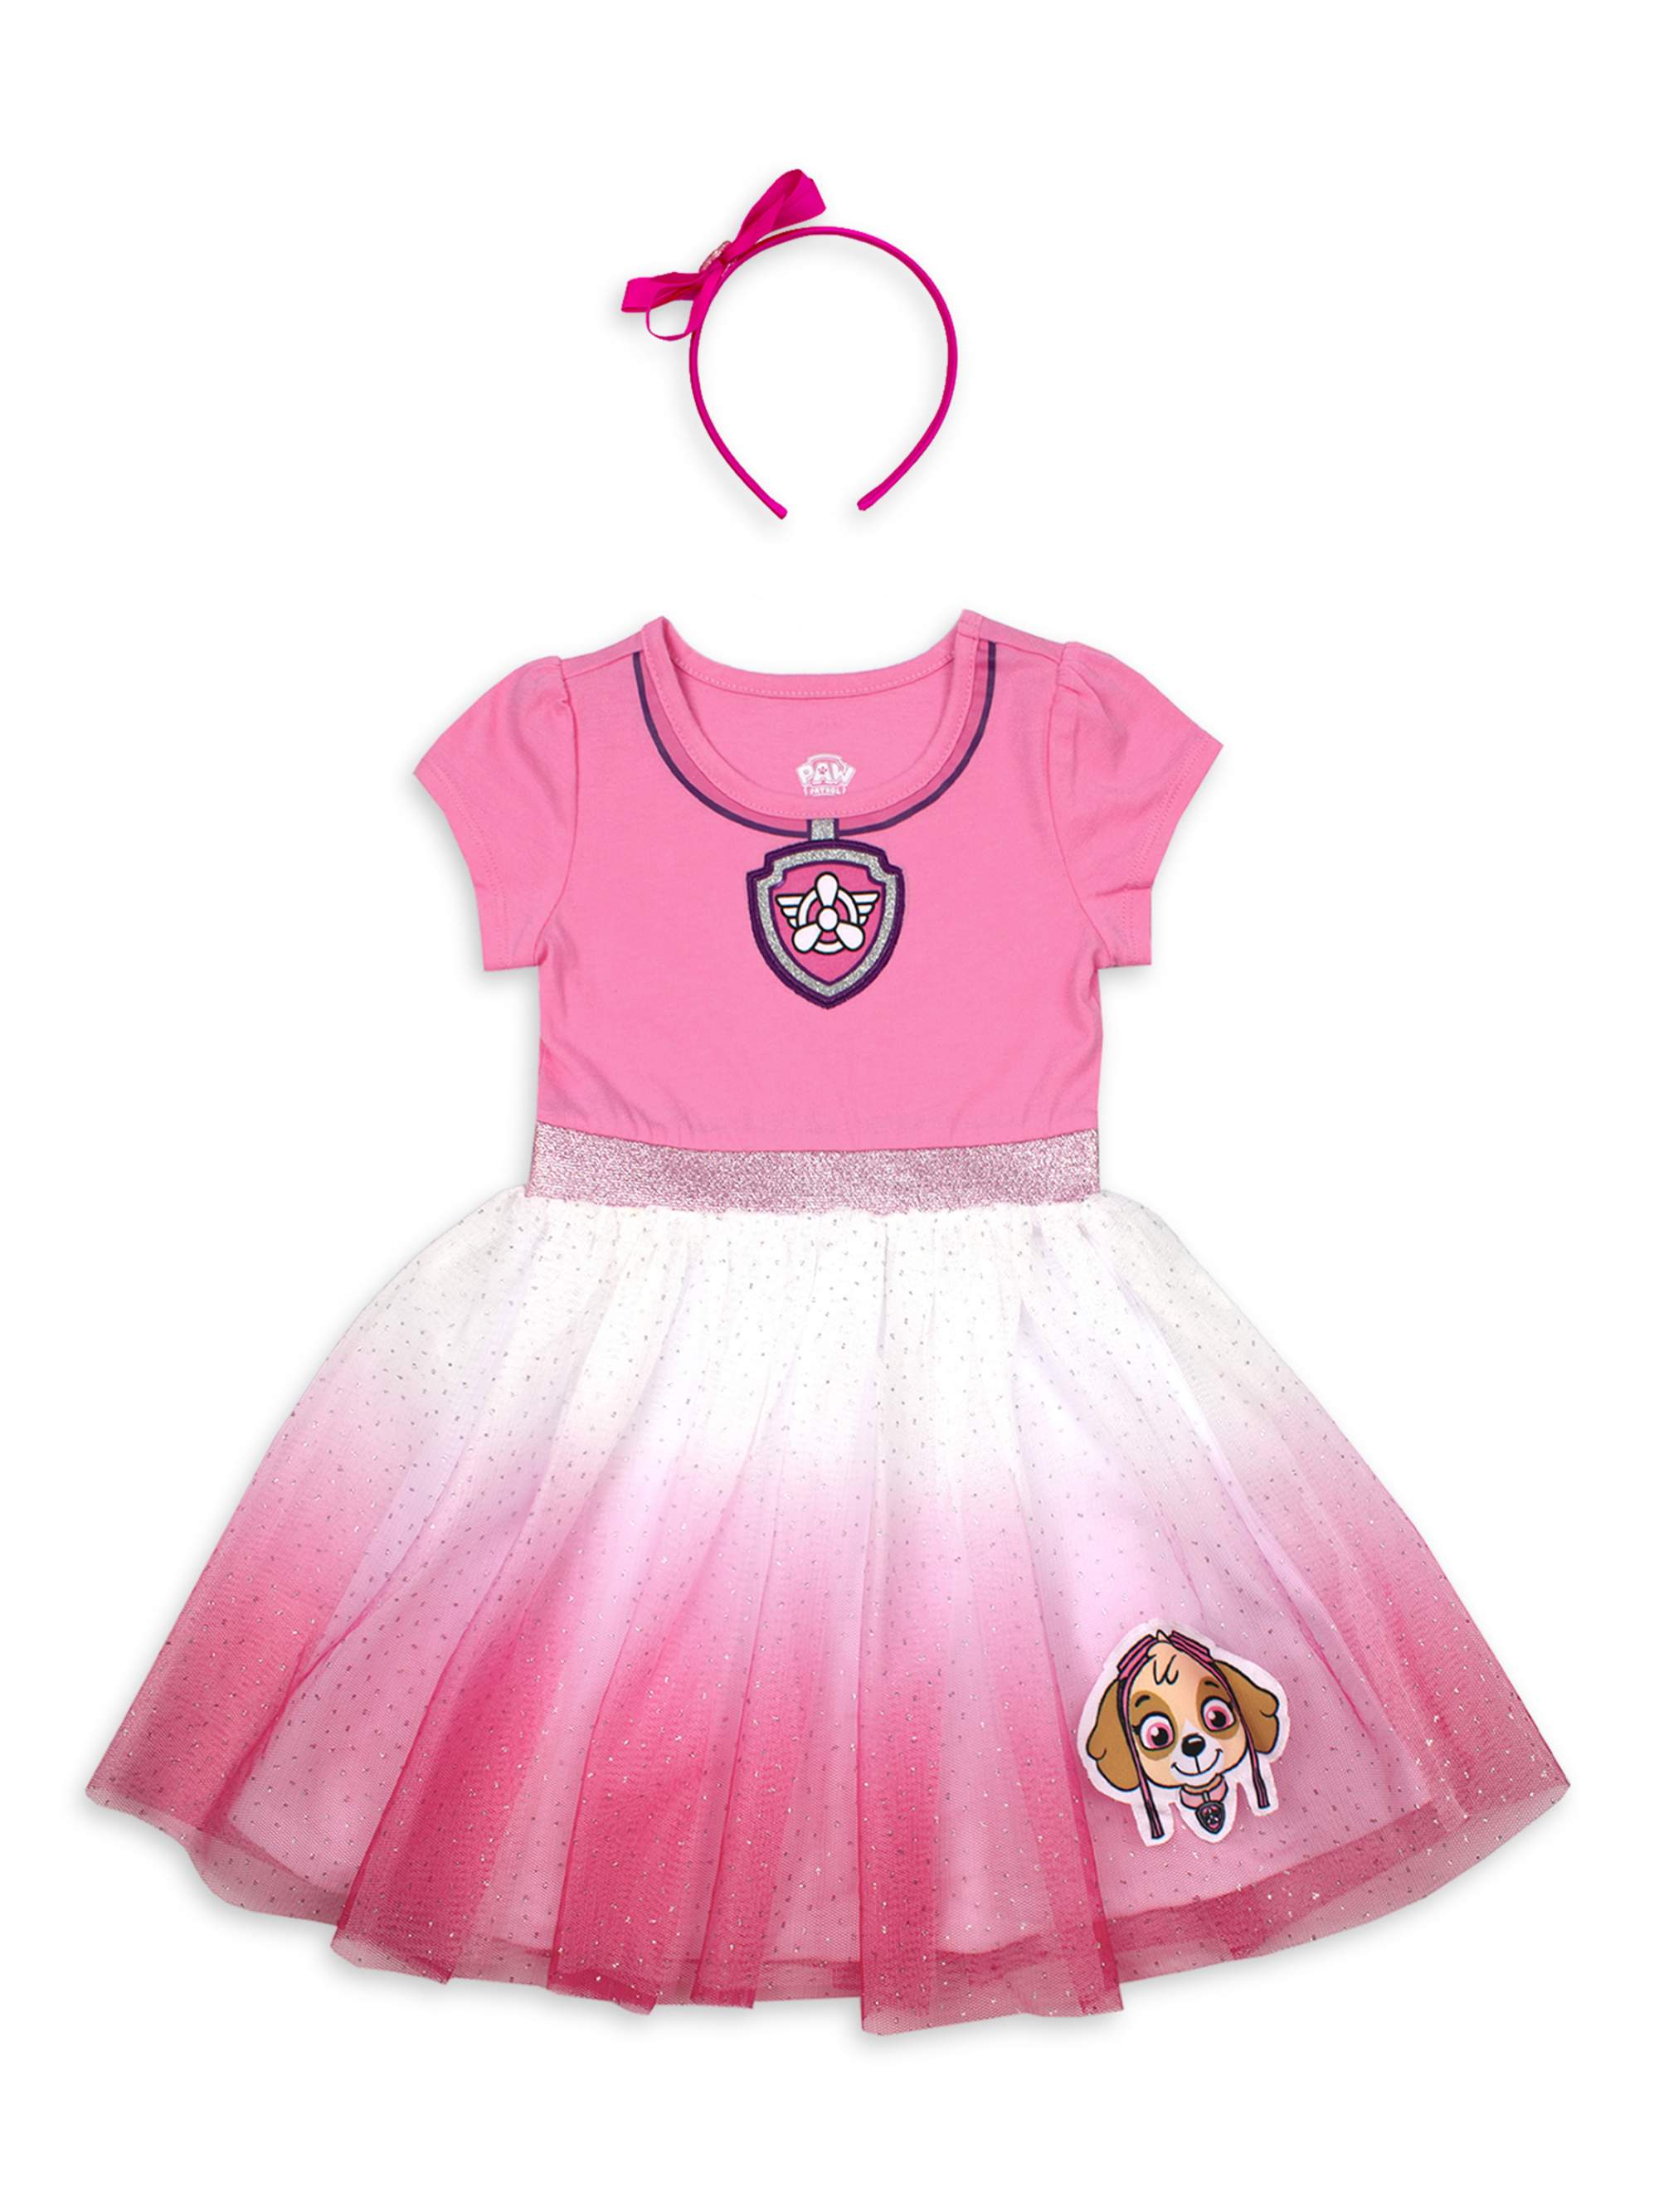 Paw Patrol Costume Tutu Dress with Headband (Toddler Girls)